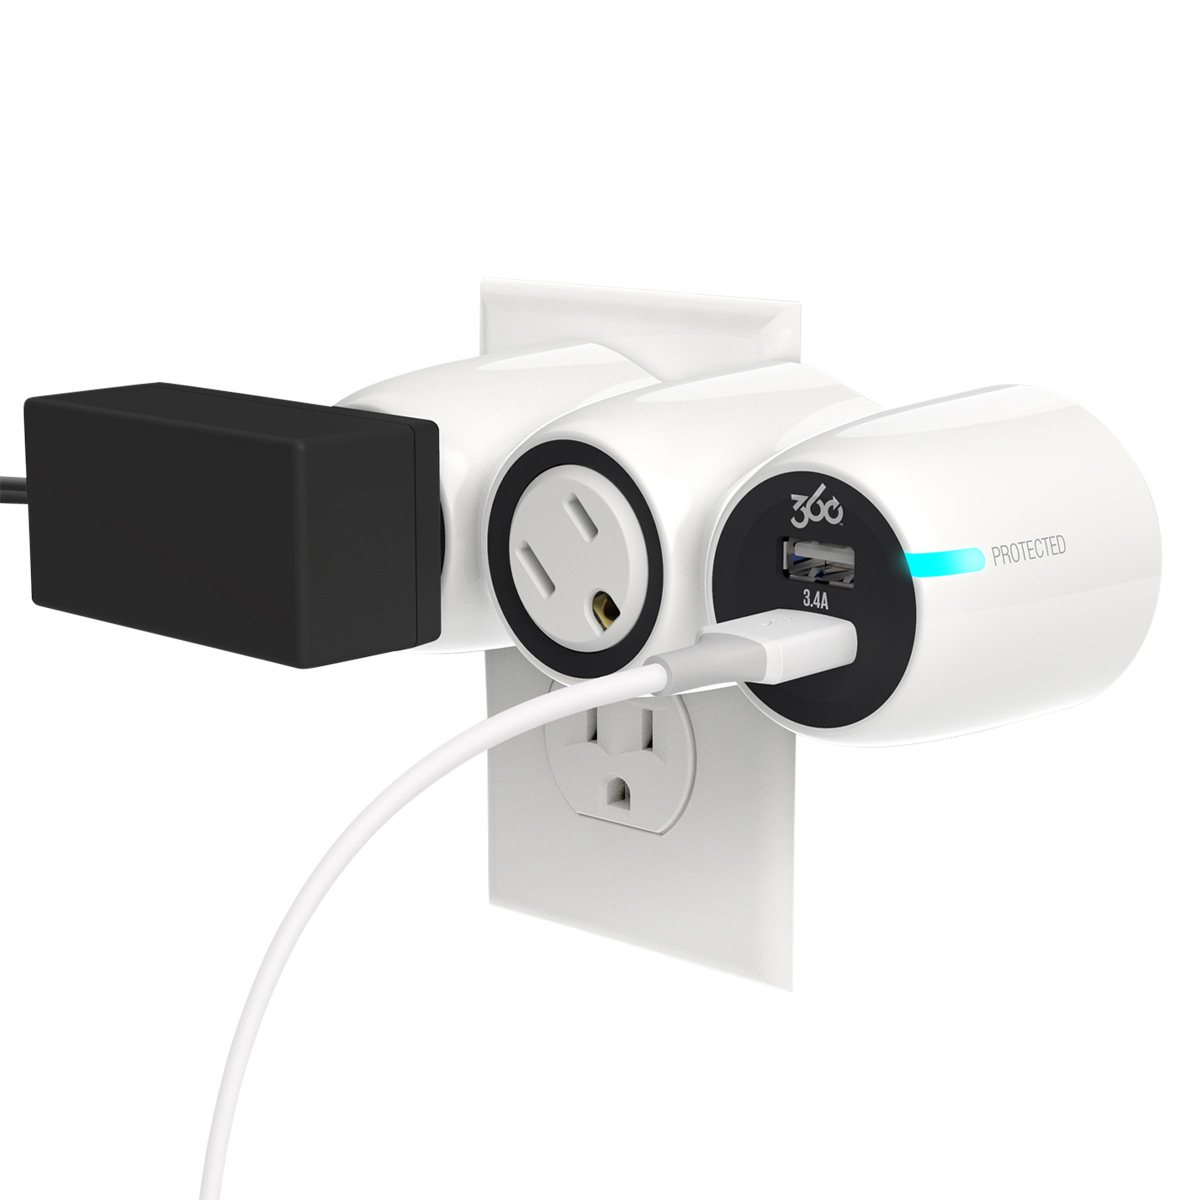 360 Electrical PowerCurve Mini 3.4 Surge Protector